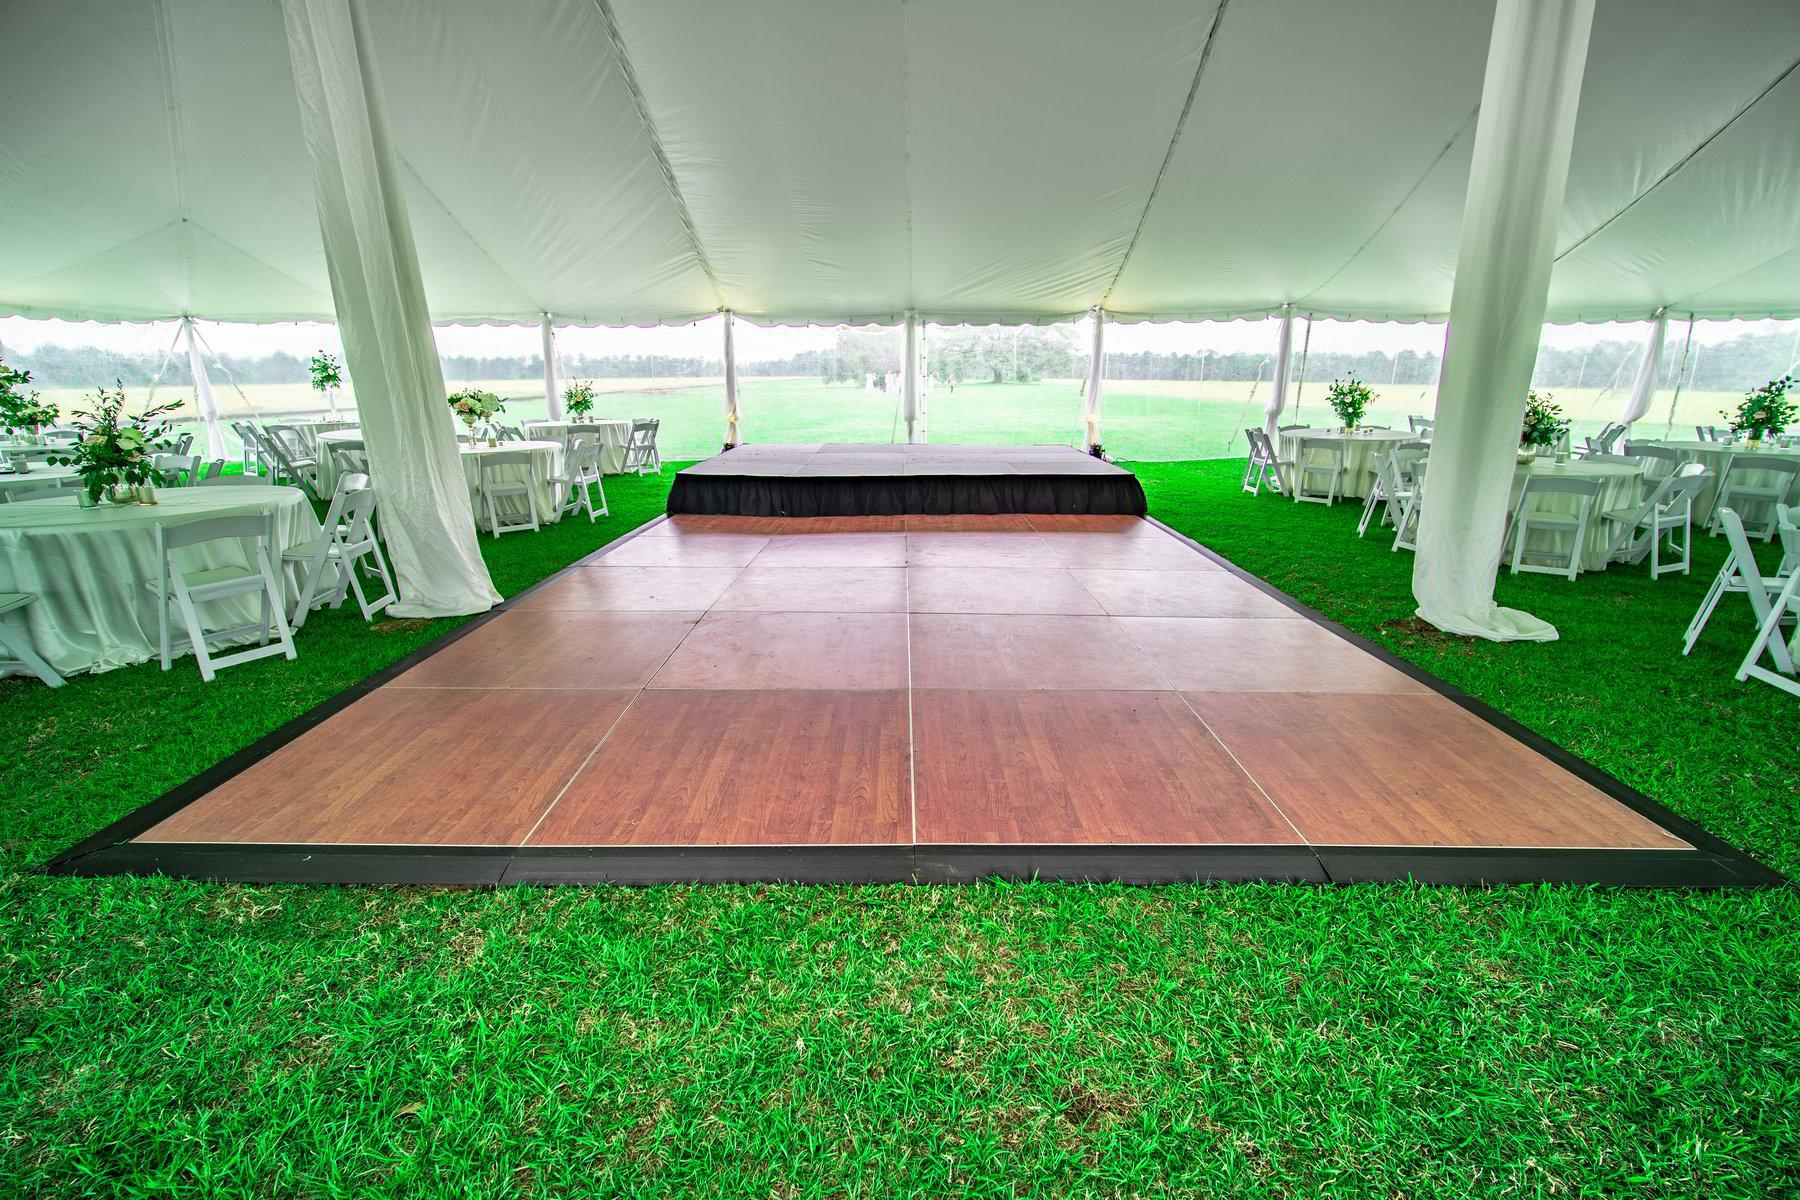 Stage Amp Dance Floor Rental Valdosta Special Occasions